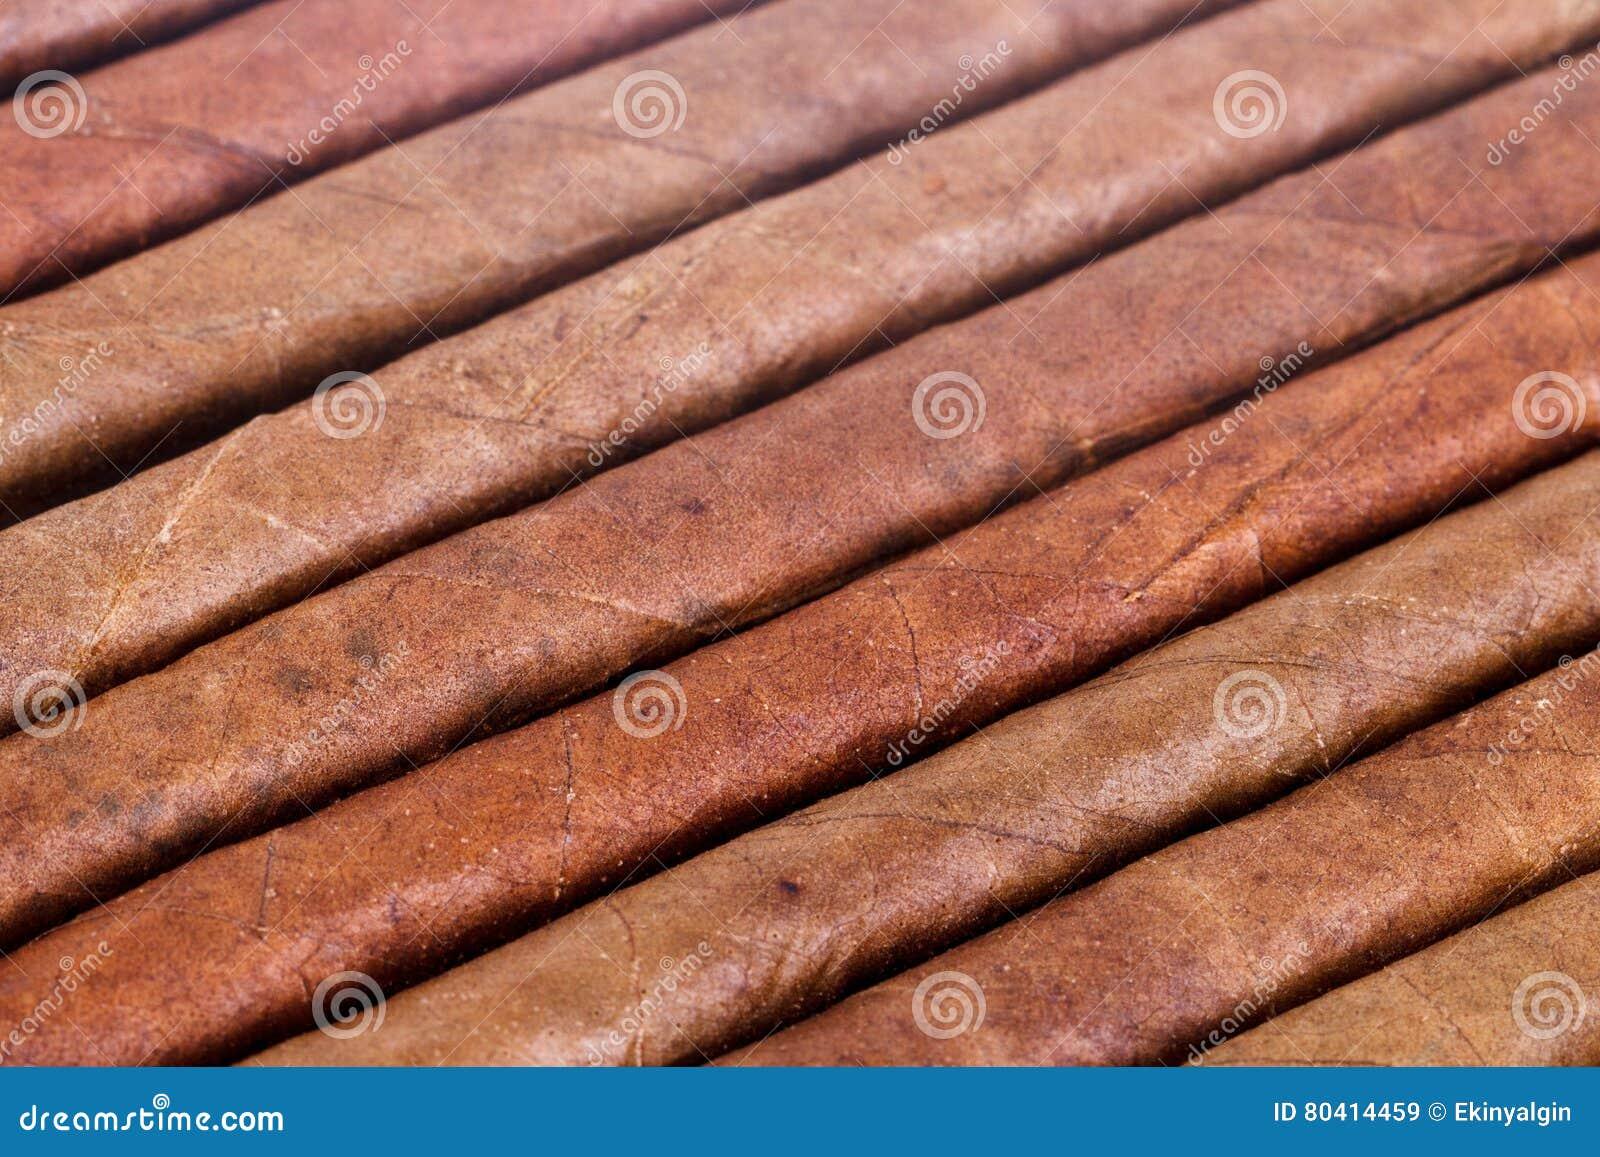 Chocolate Cigars In Row Stock Photo - Image: 80414459